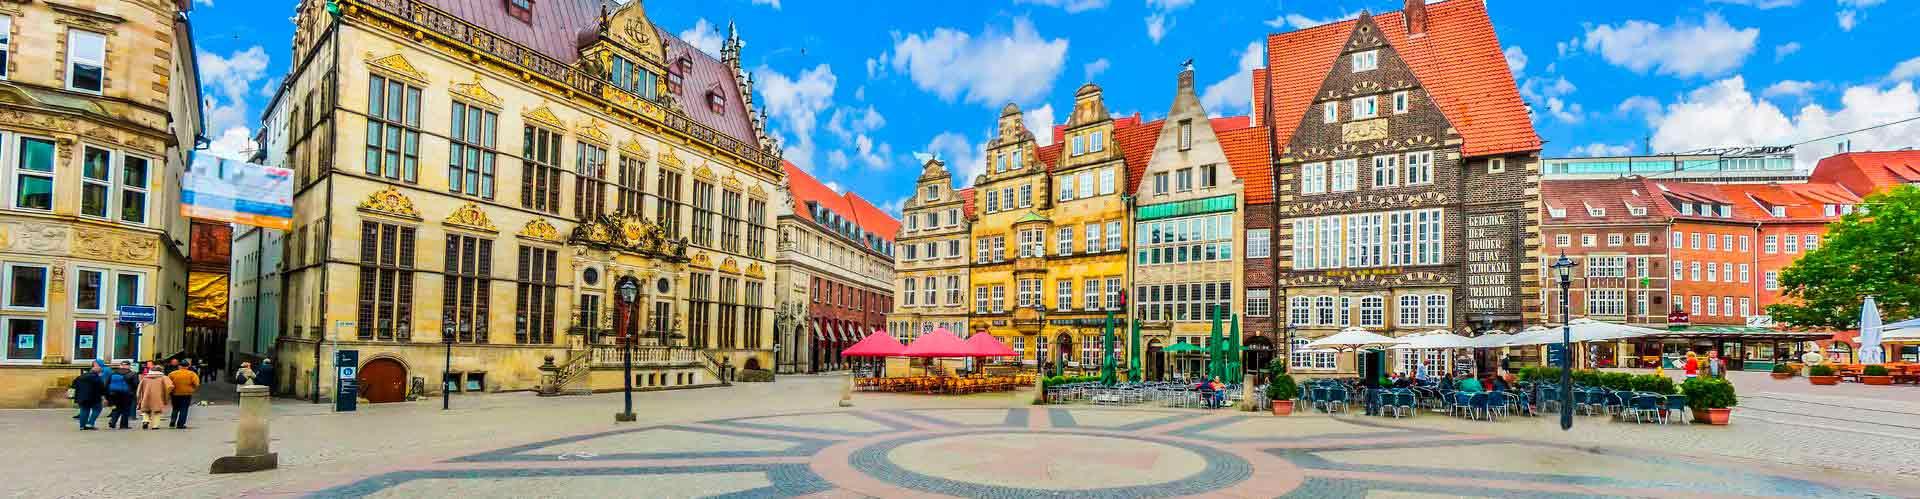 Free Tour Bremen - Turismo de Alemania